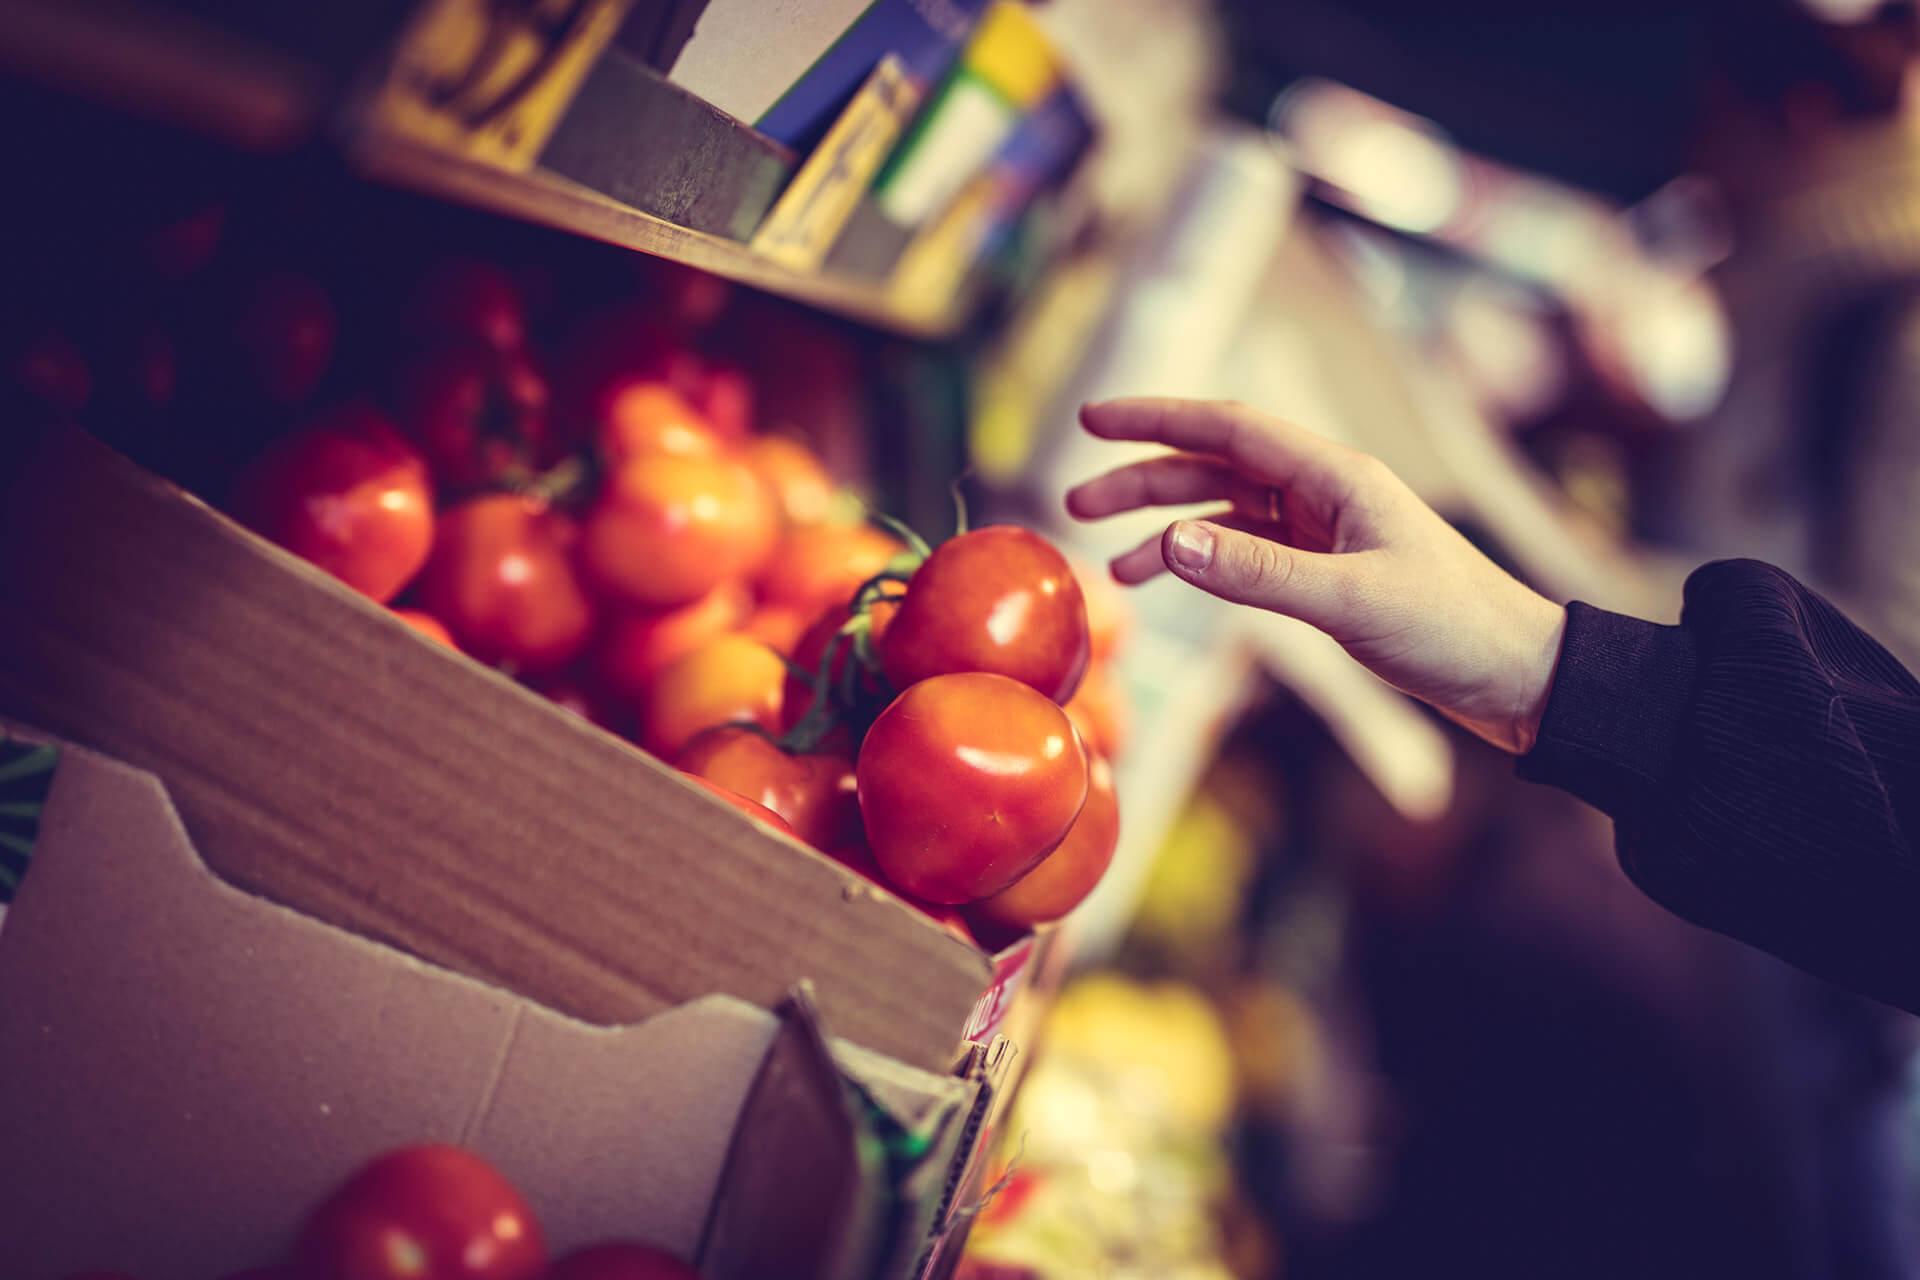 Grønlands Torg - Tomater og annet frukt og grønt